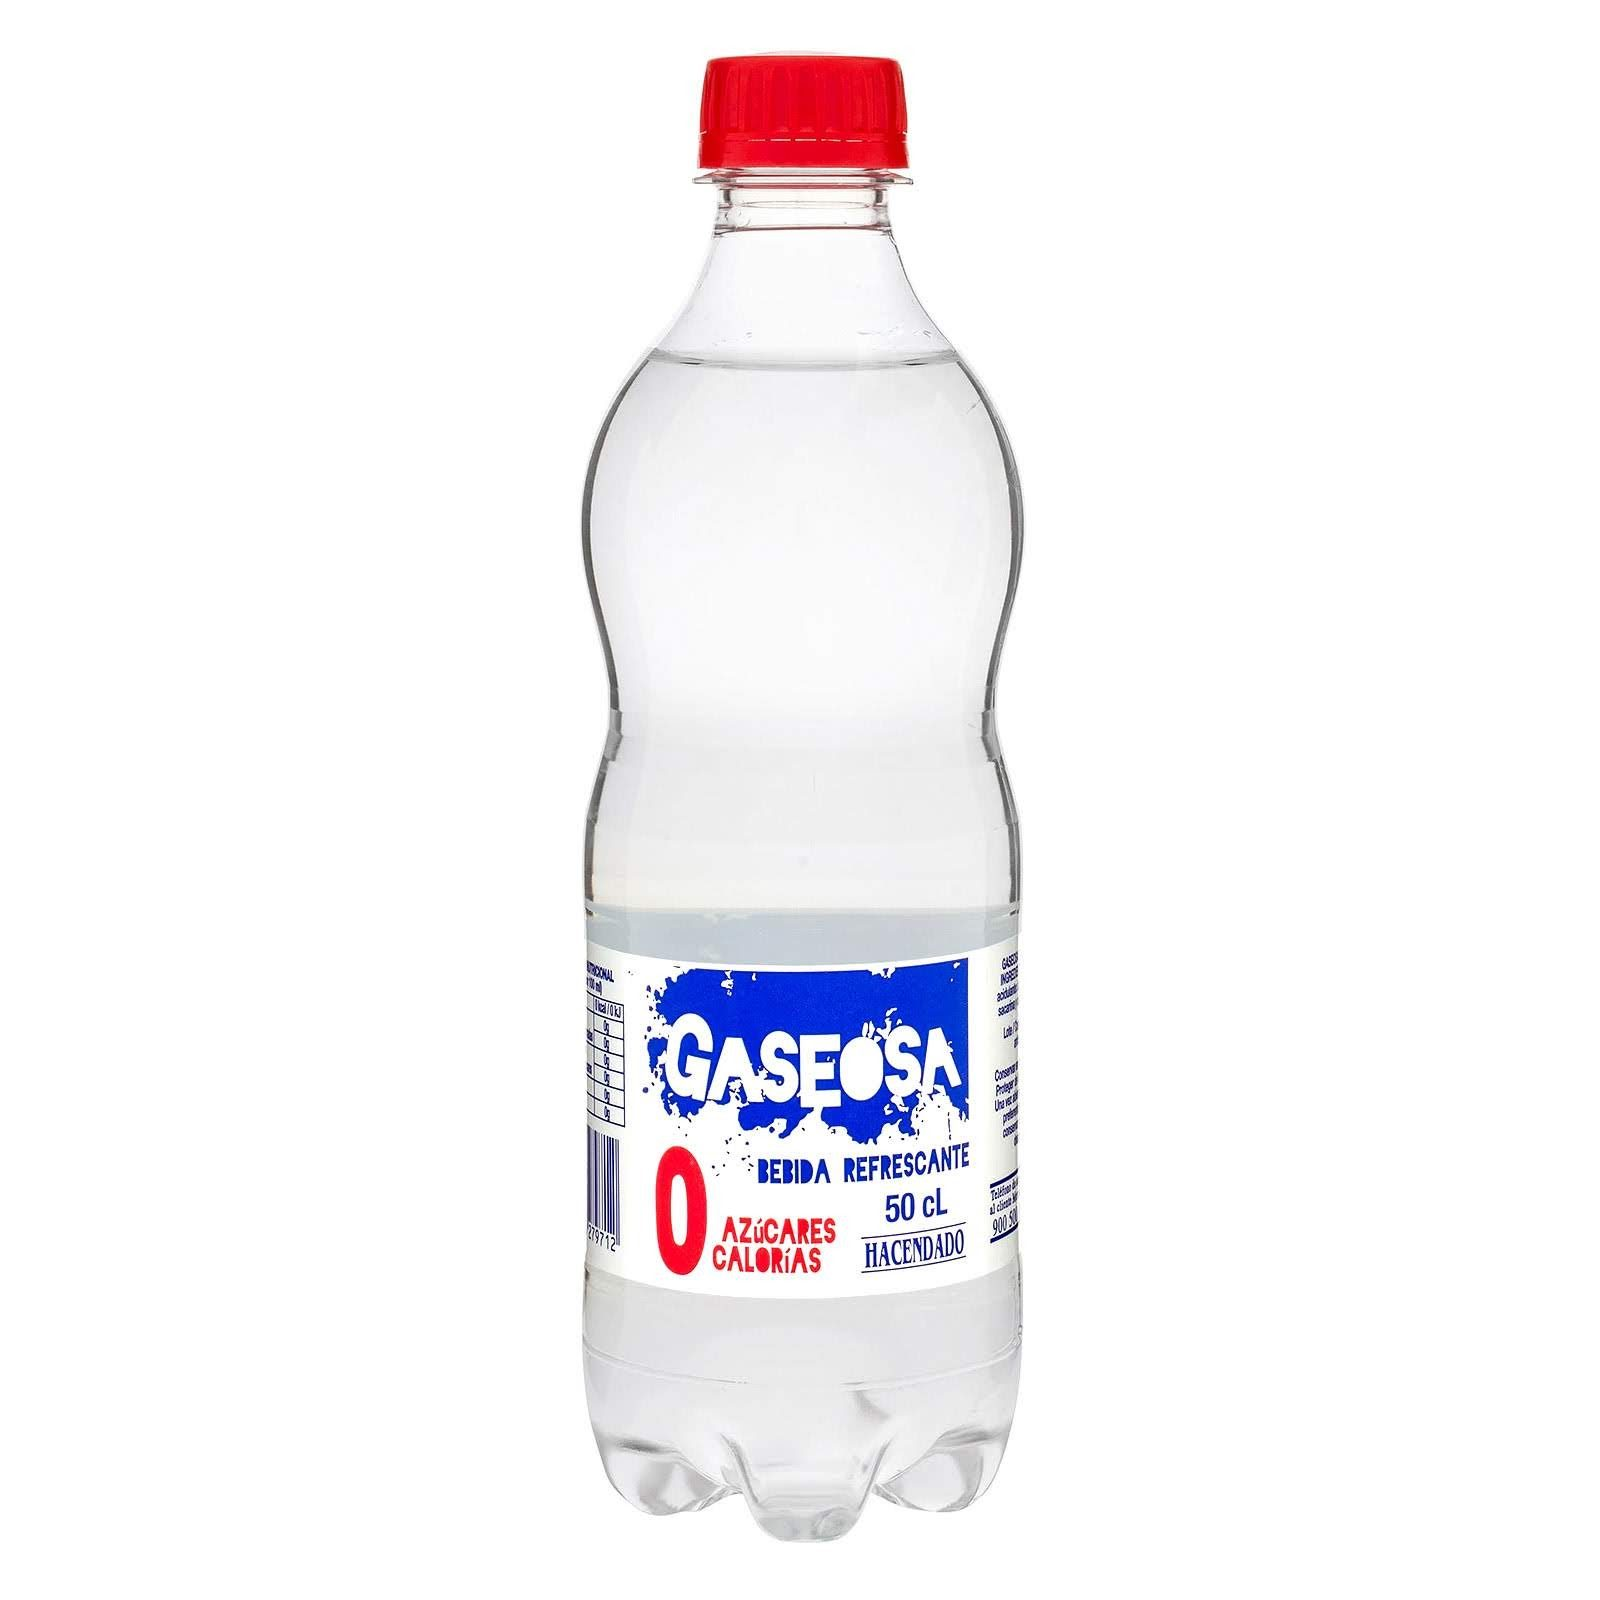 gaseosa-hacendado-mercadona-1-5668253